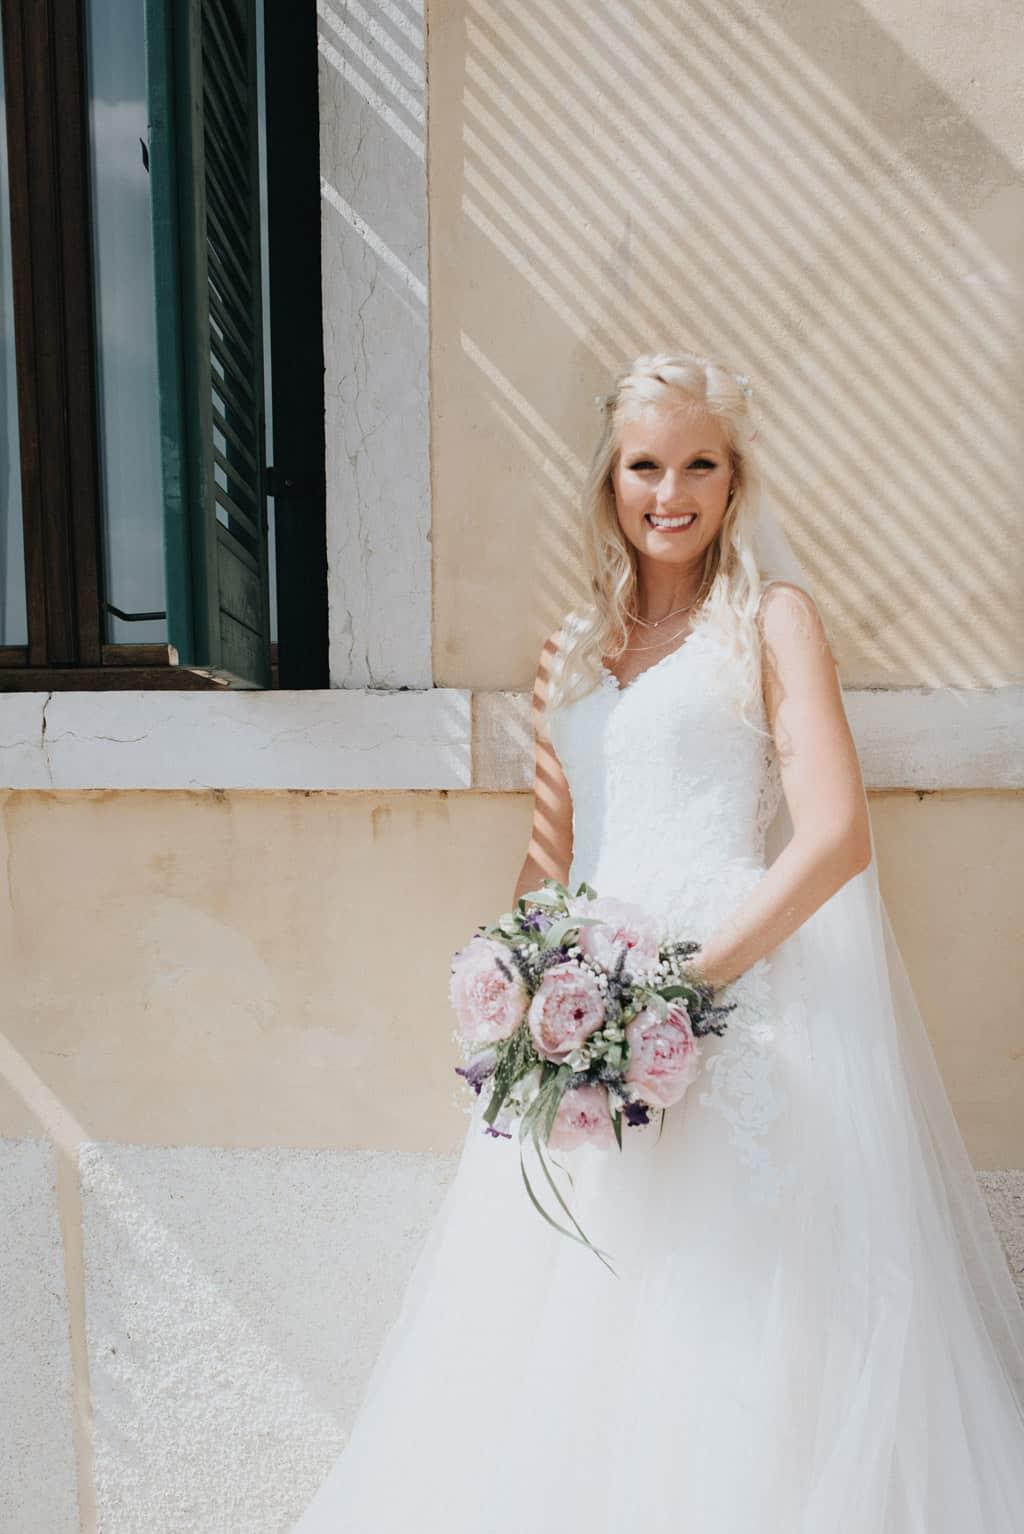 807 ceremony in villa cariola Da Monaco alla Valpolicella   matrimonio Villa Cariola